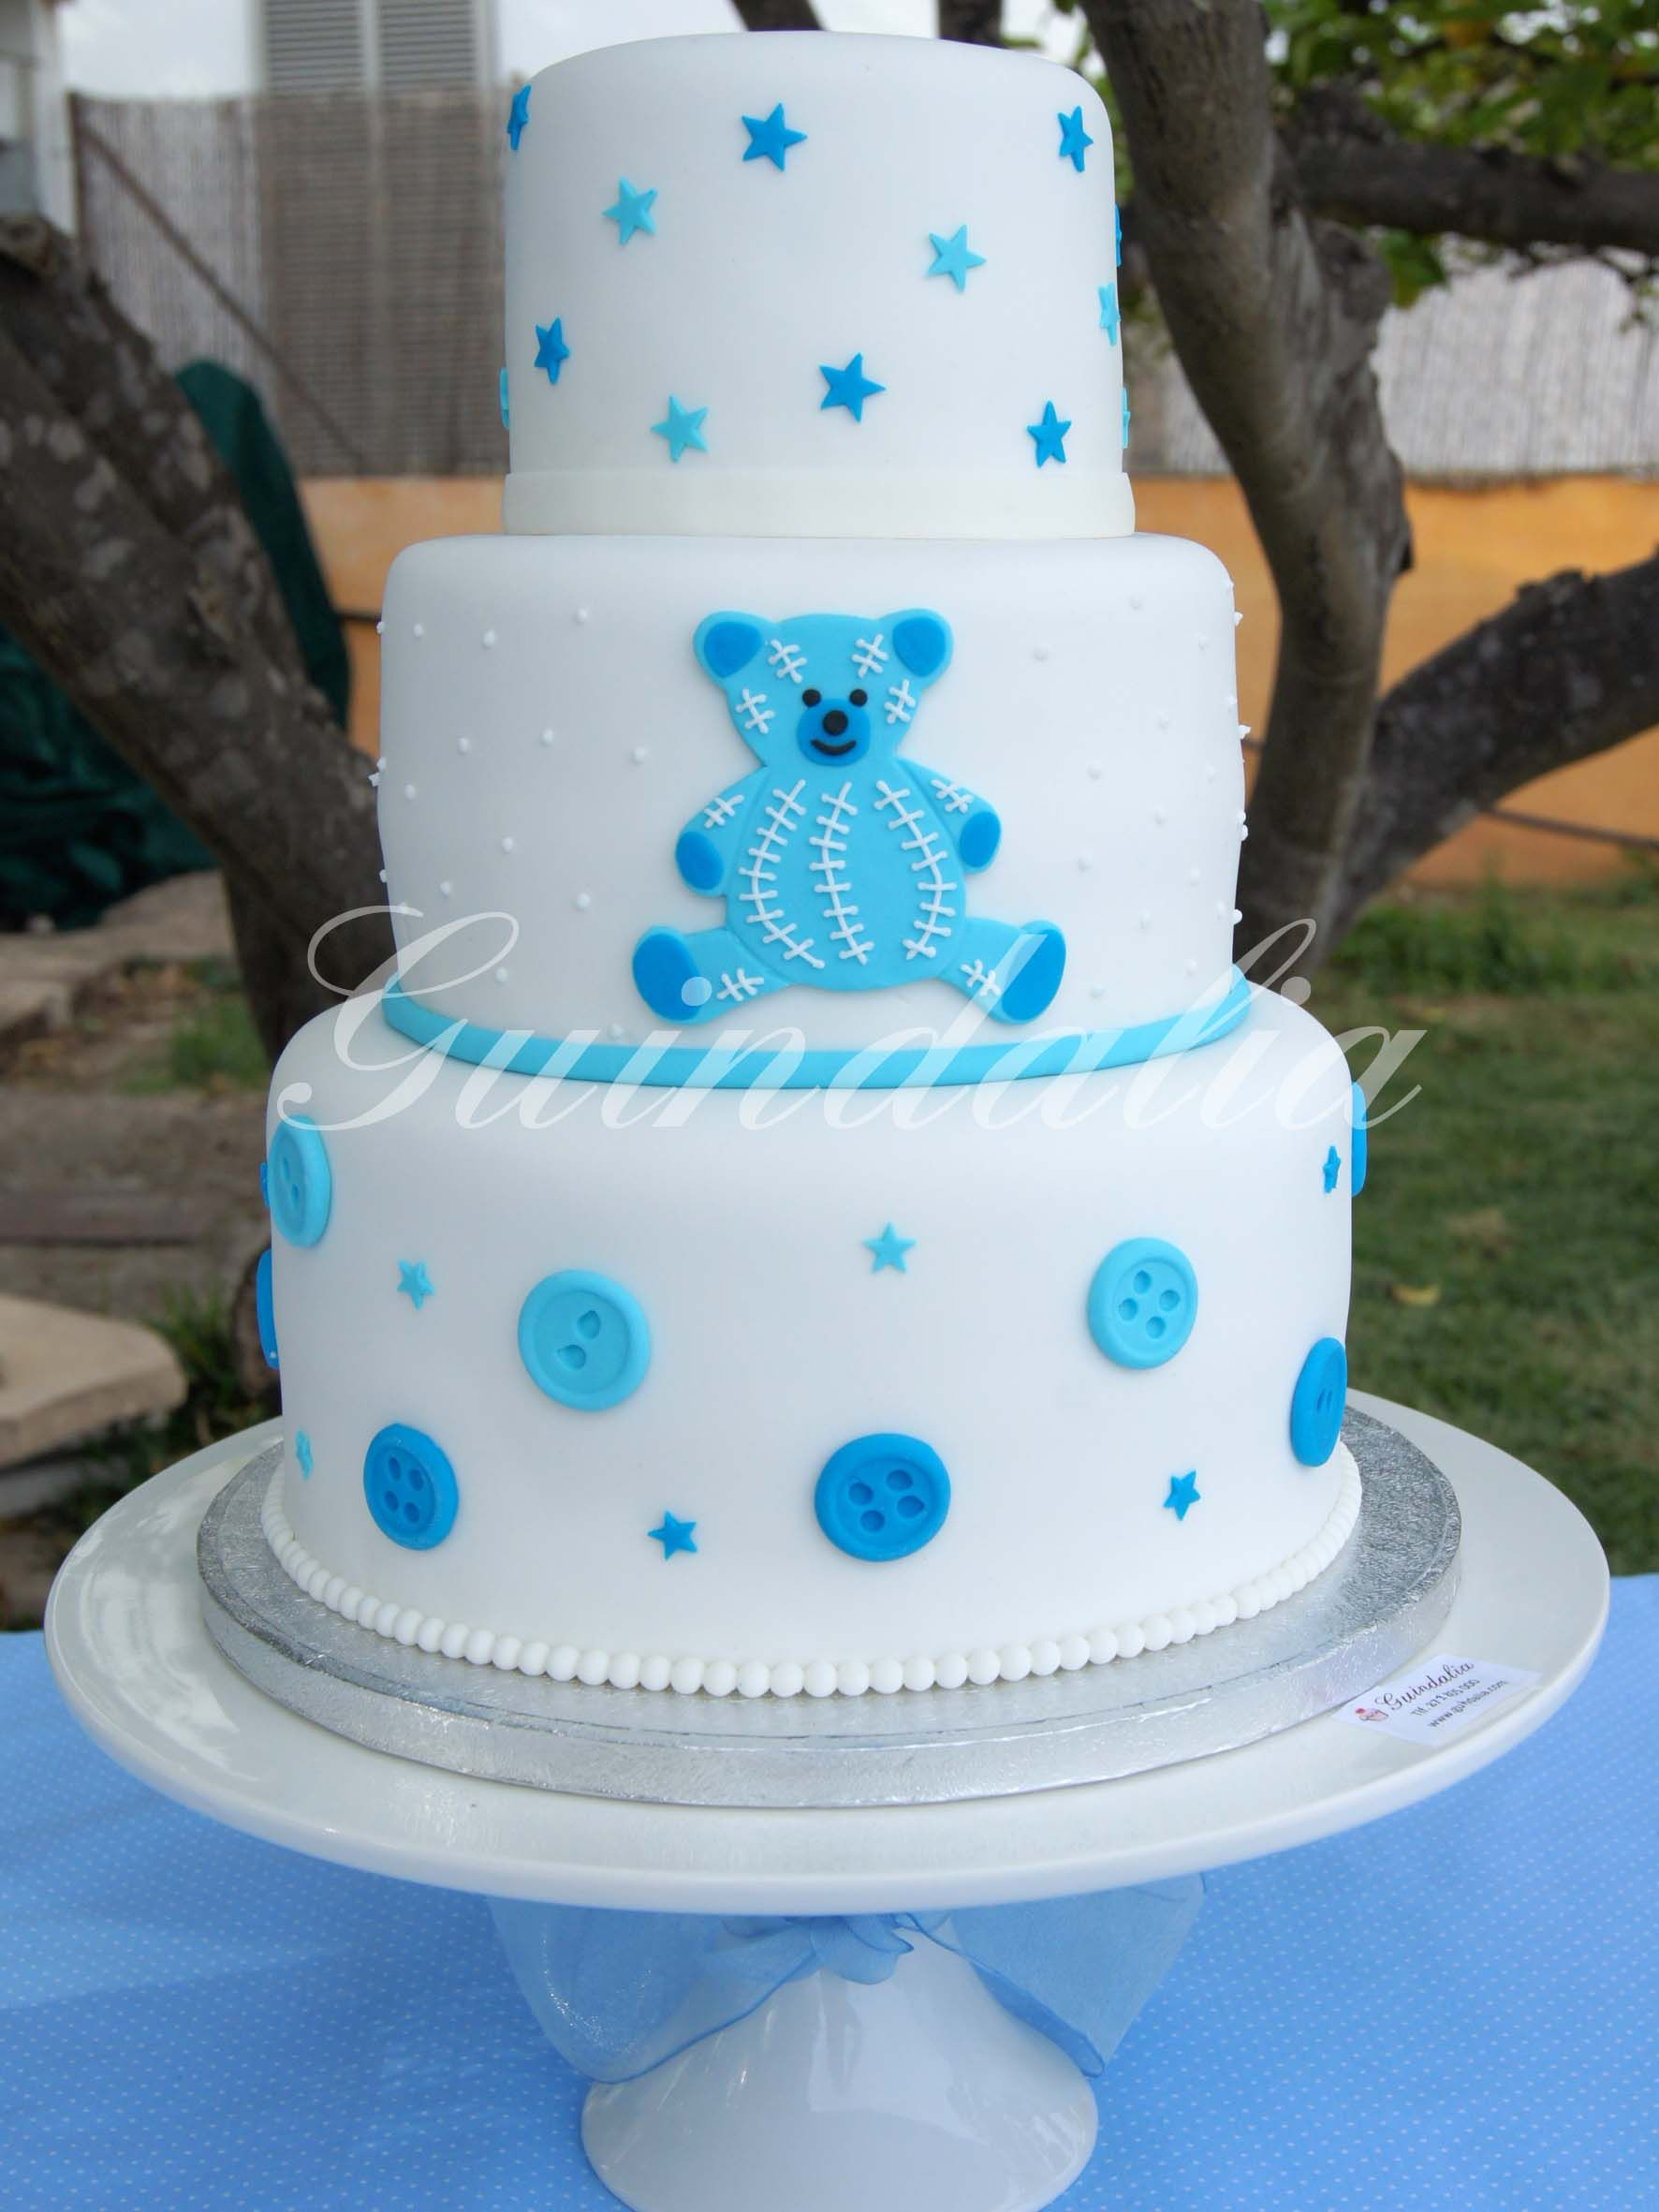 Tarta De Tres Pisos Con Detalle Osito Para Bautizo Cake Holidays And Events Desserts